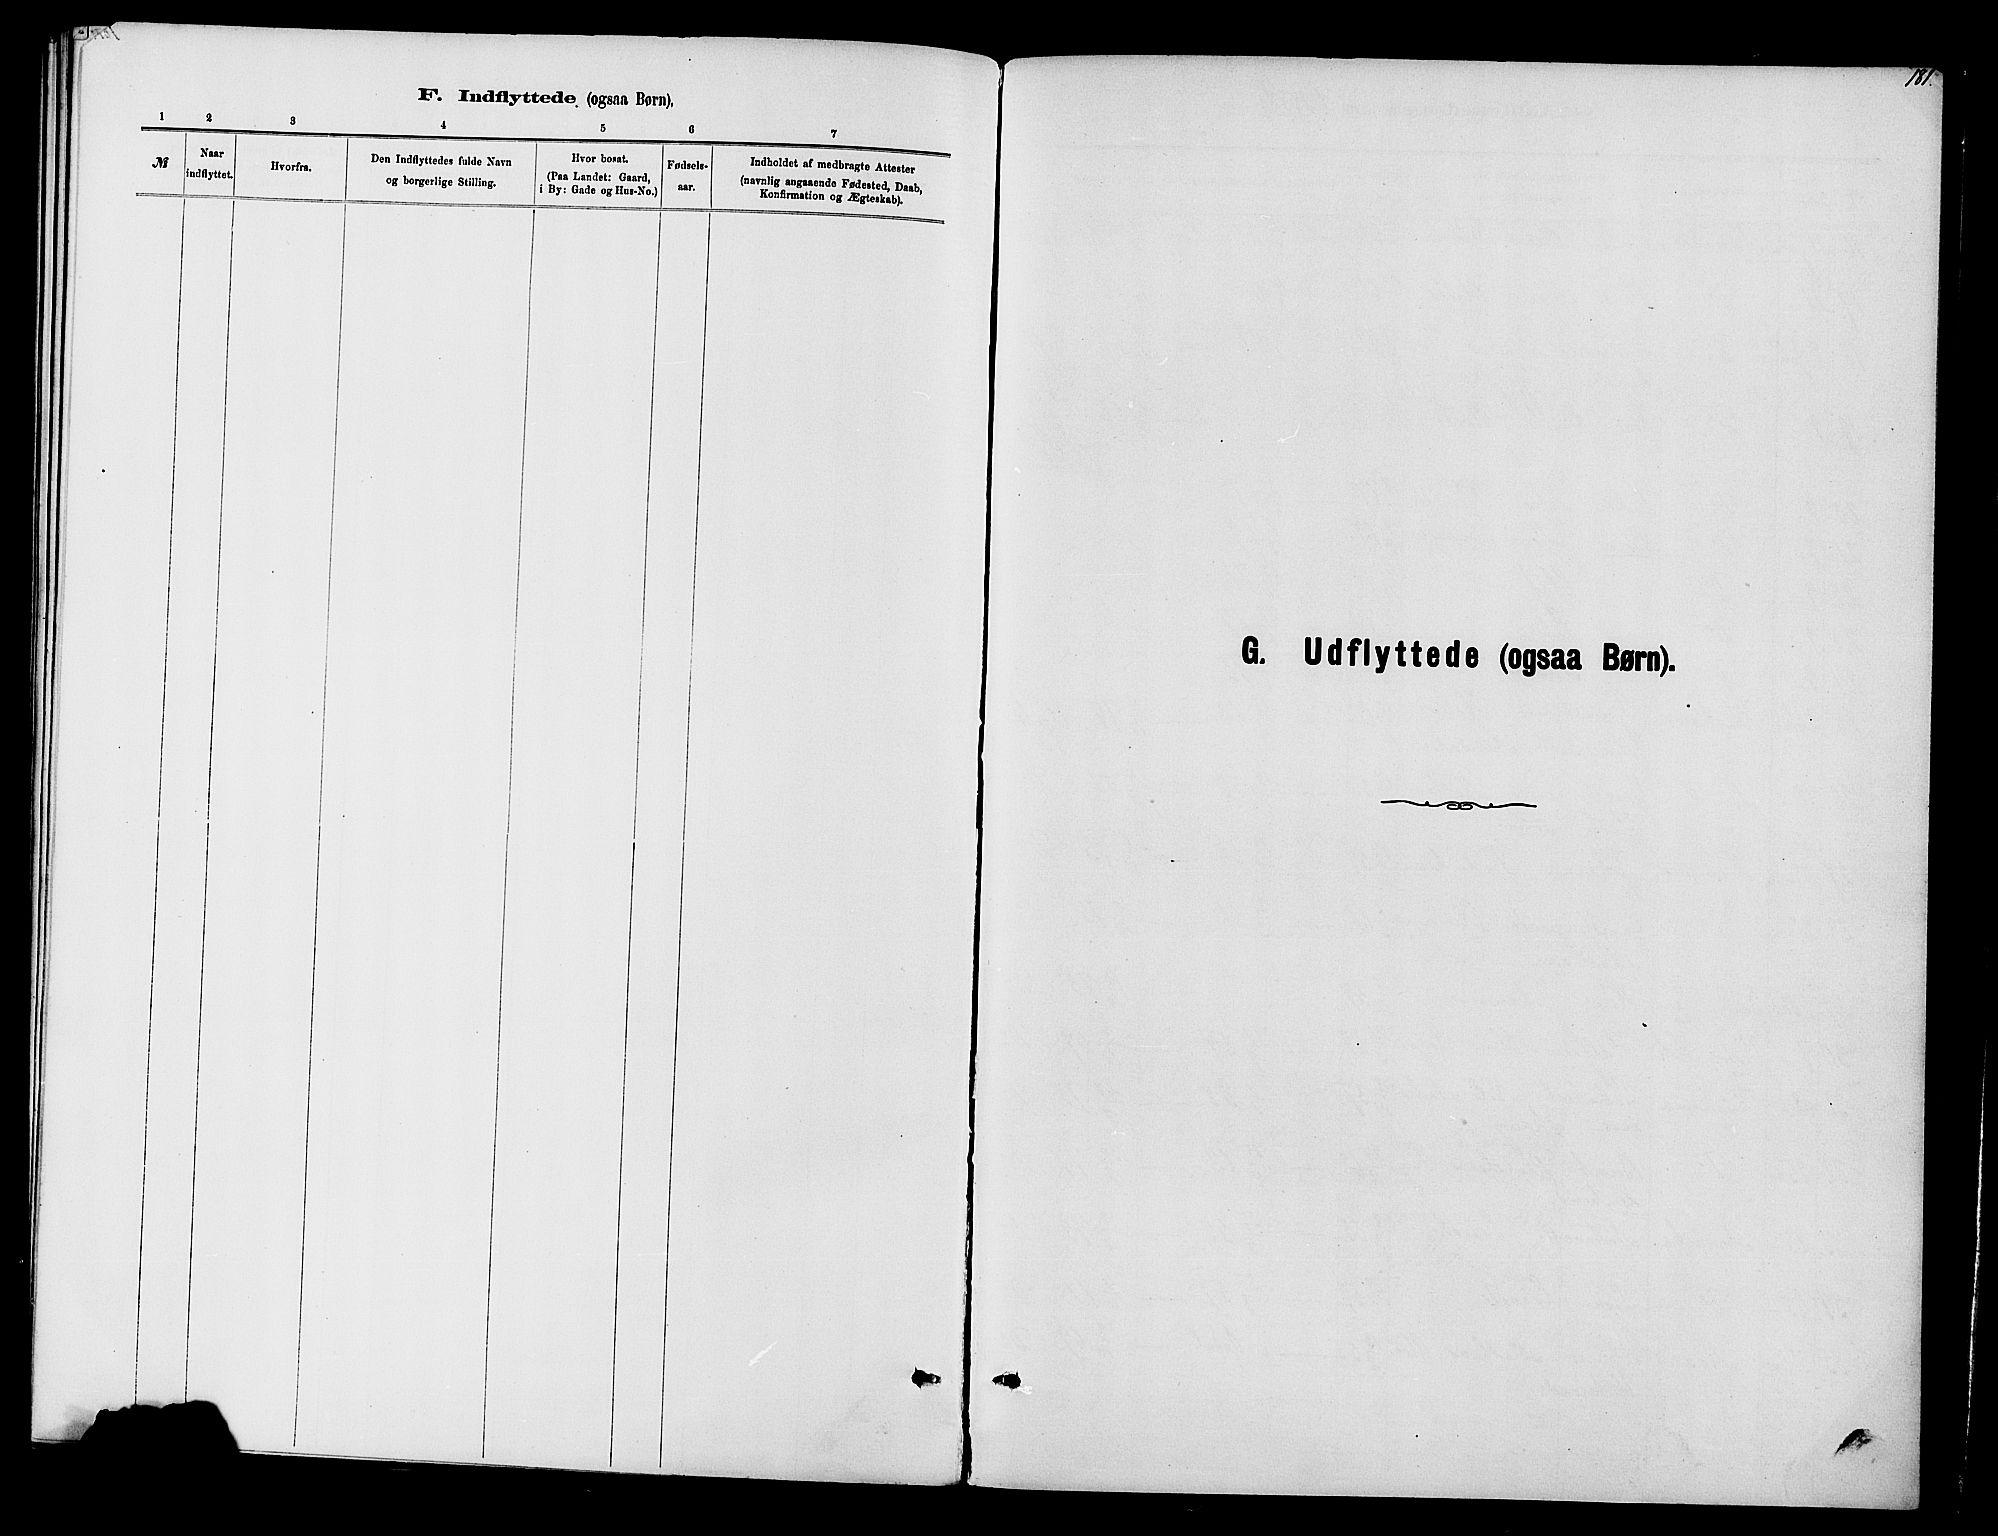 SAH, Vardal prestekontor, H/Ha/Haa/L0010: Ministerialbok nr. 10, 1878-1893, s. 181